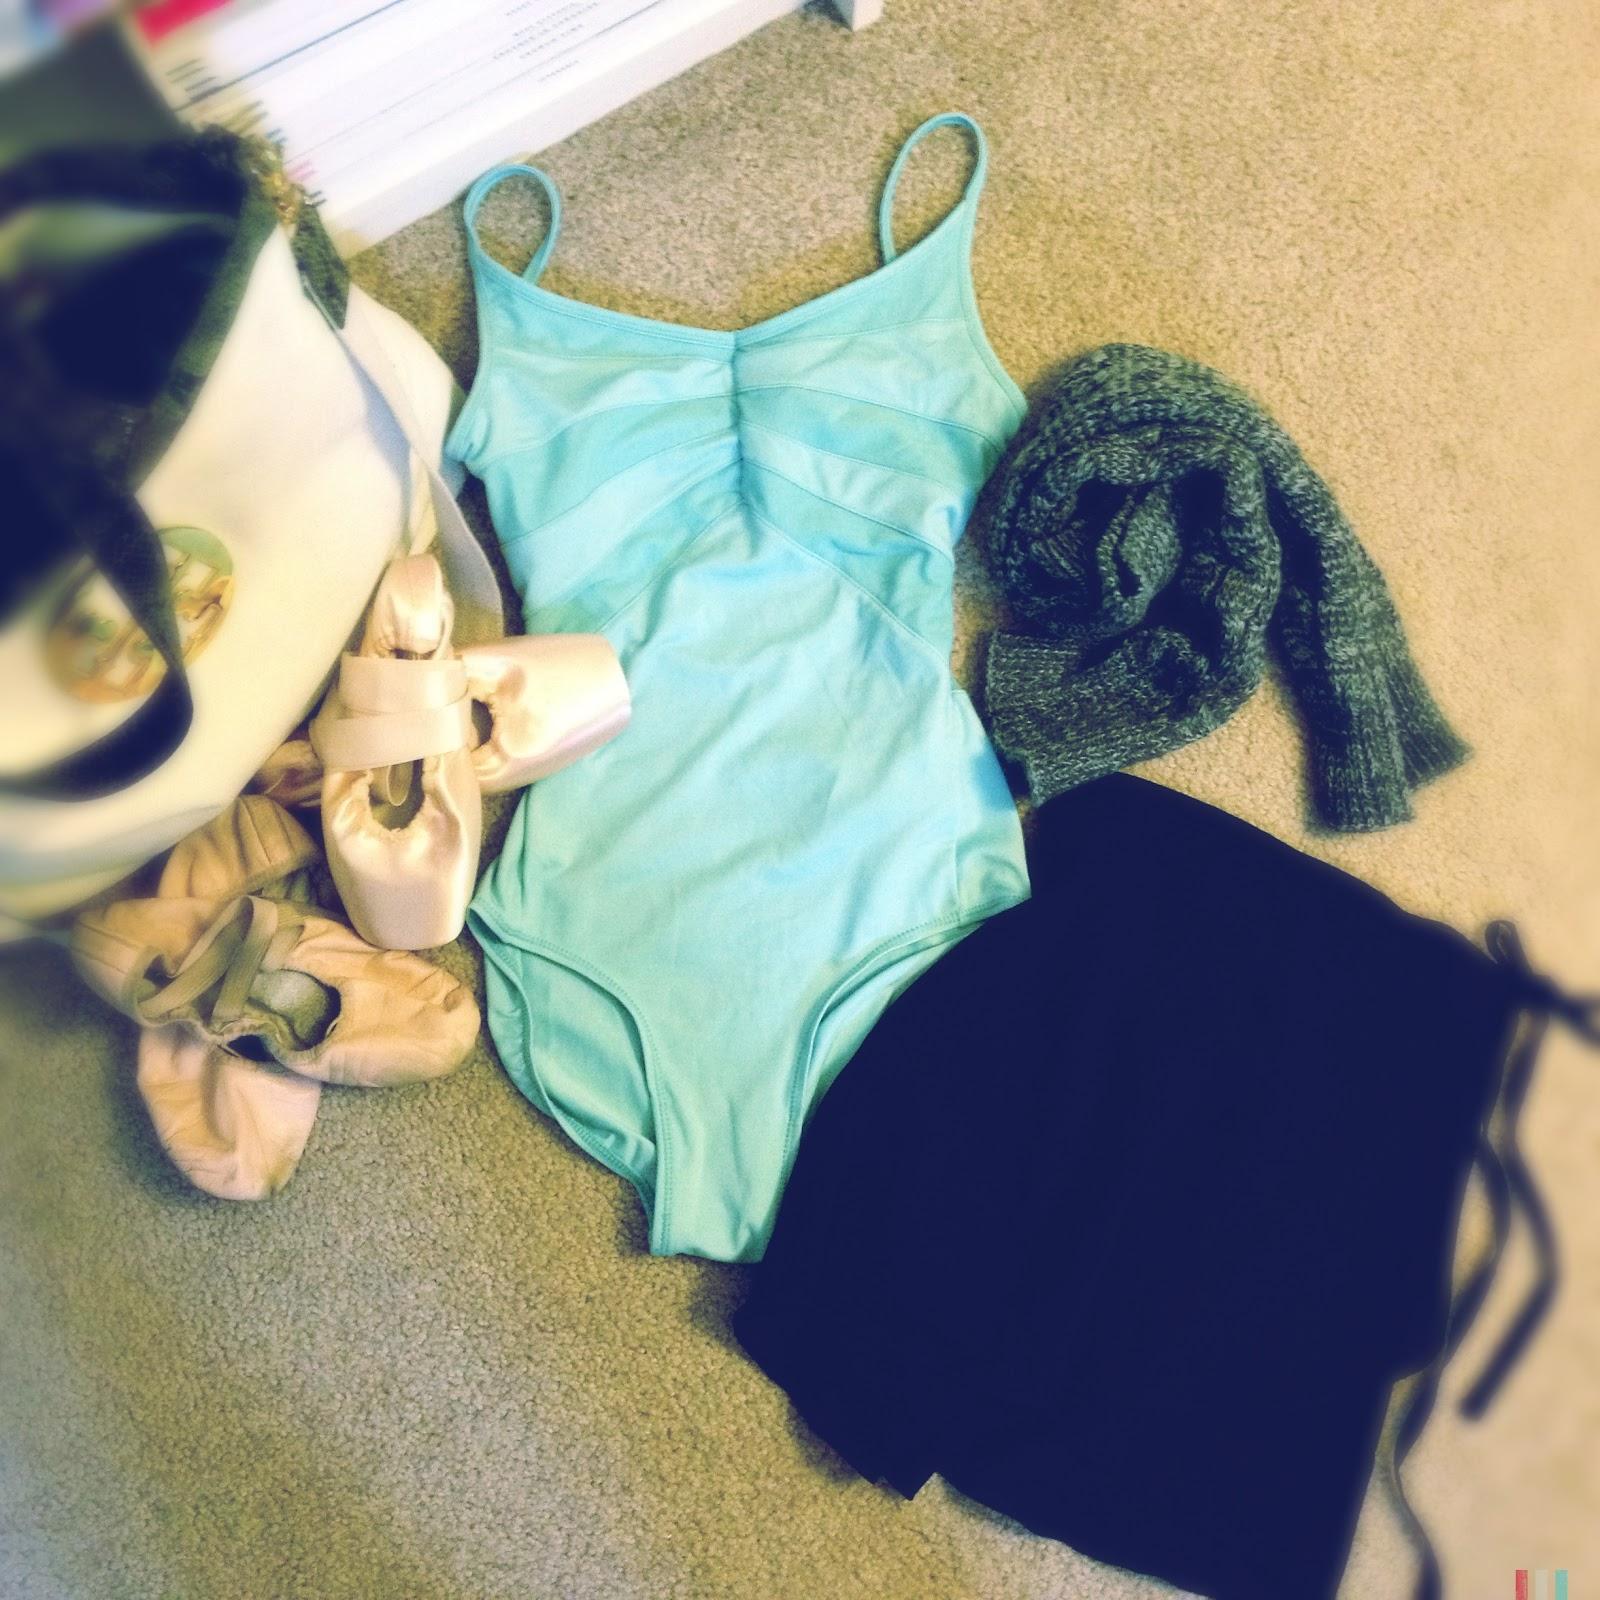 Buy danskin now - girls ballet dance slippers at walmartcom